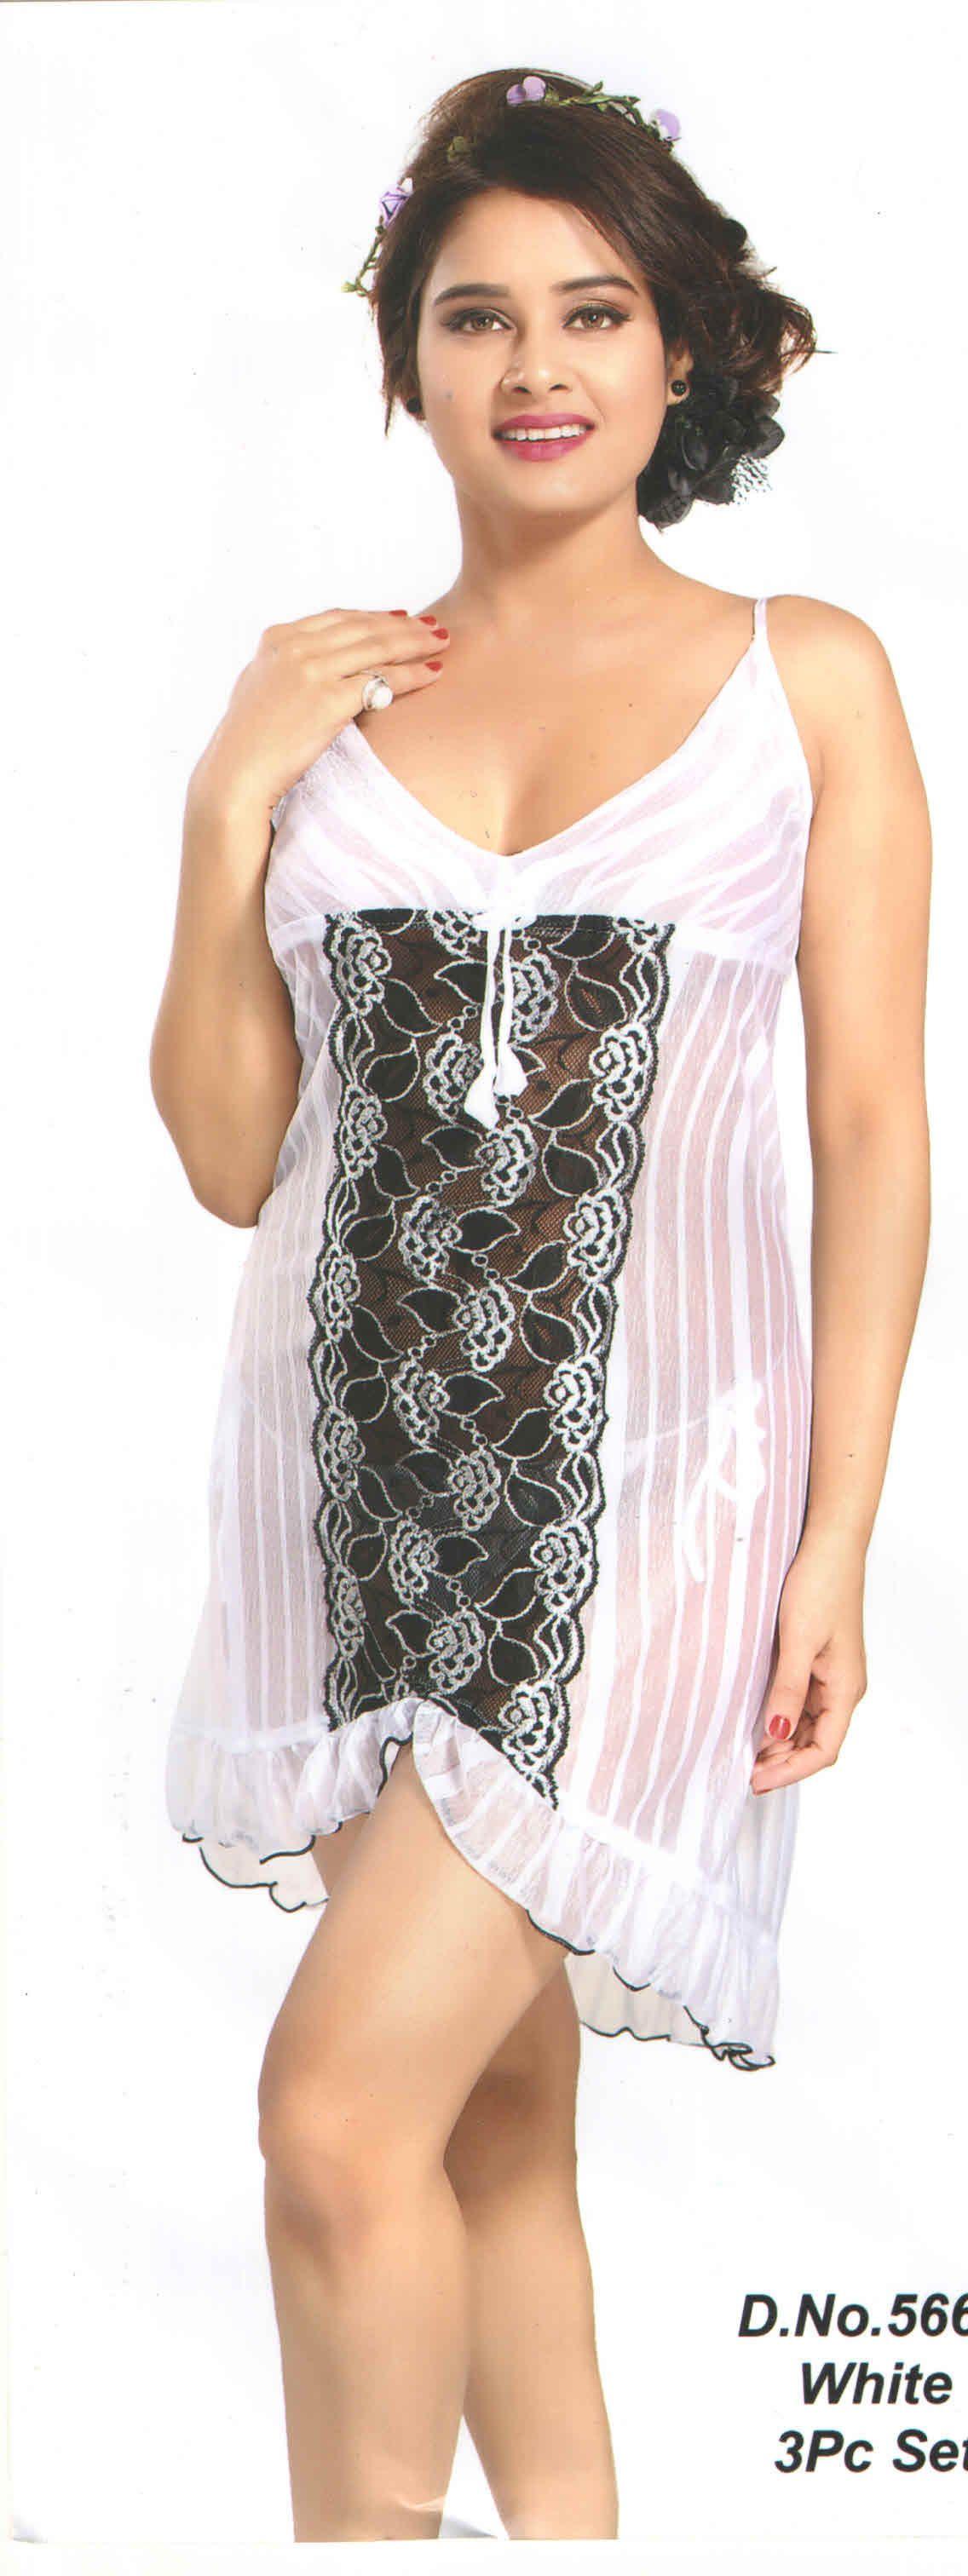 33ee60ec590 Shop 3pc Babydoll Nighty Set By indiatrendzs At Ebay http   stores.ebay